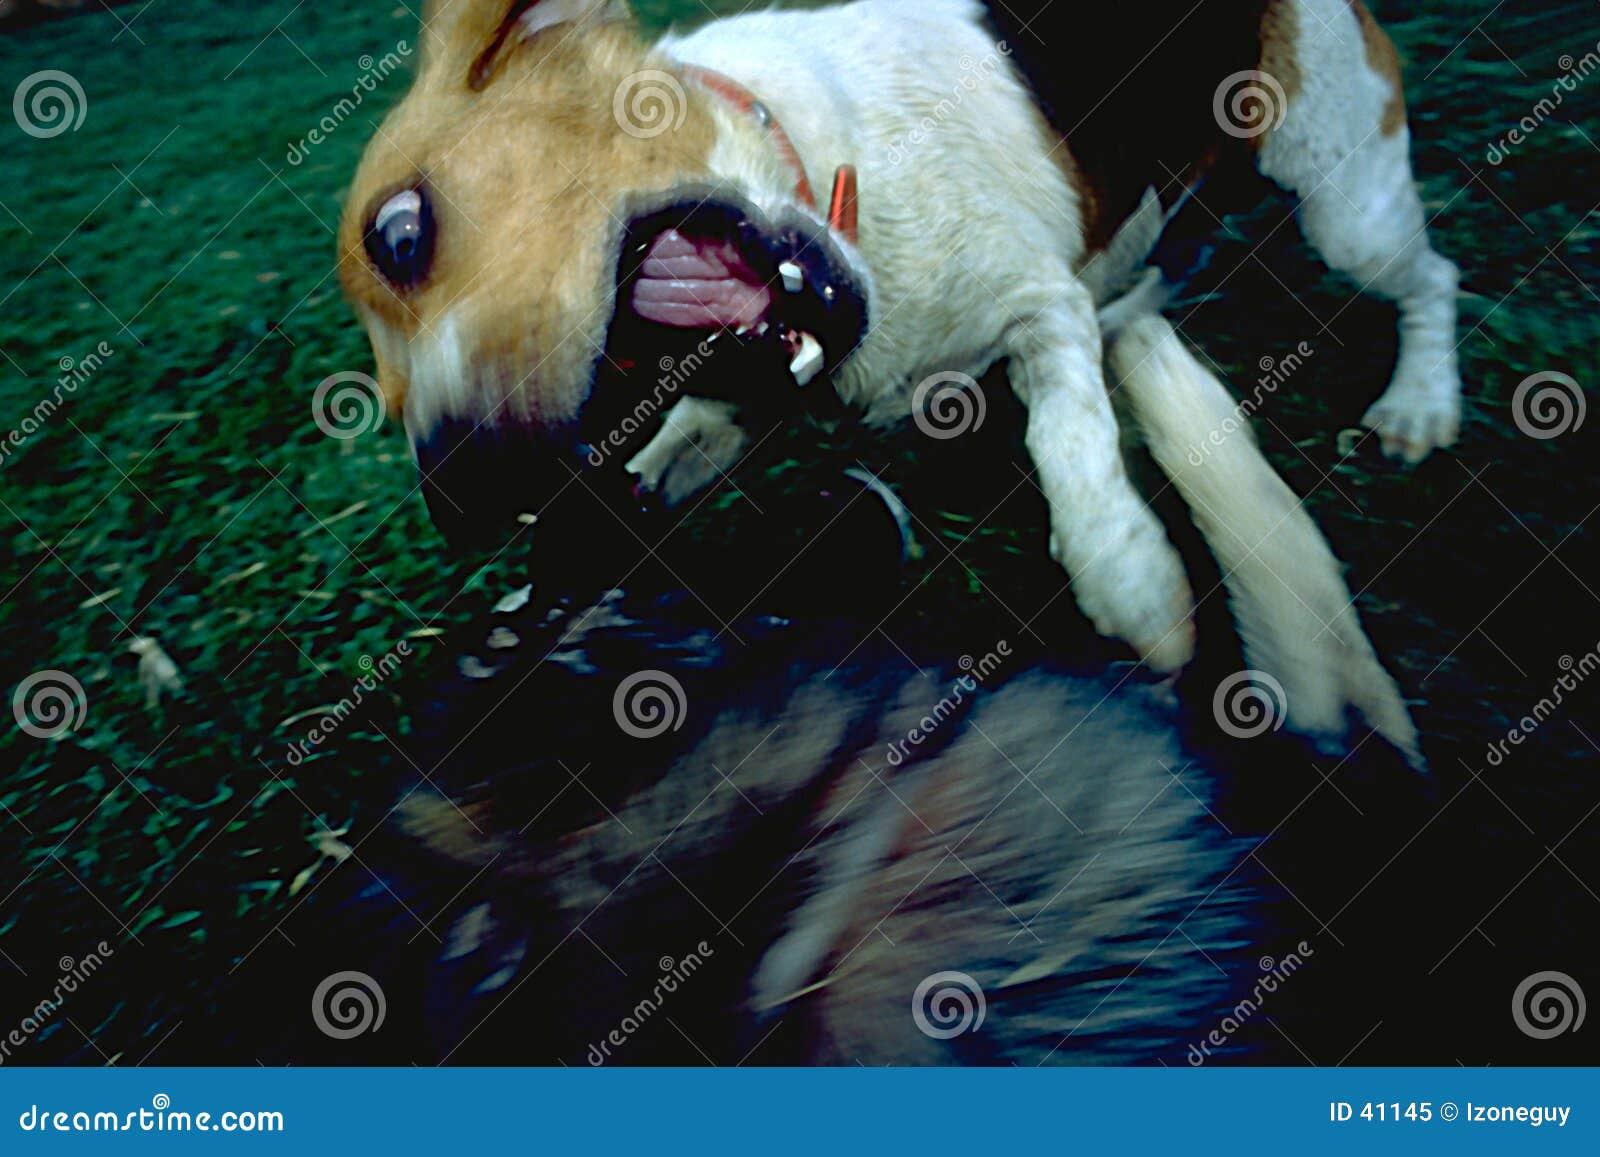 Atakować psa